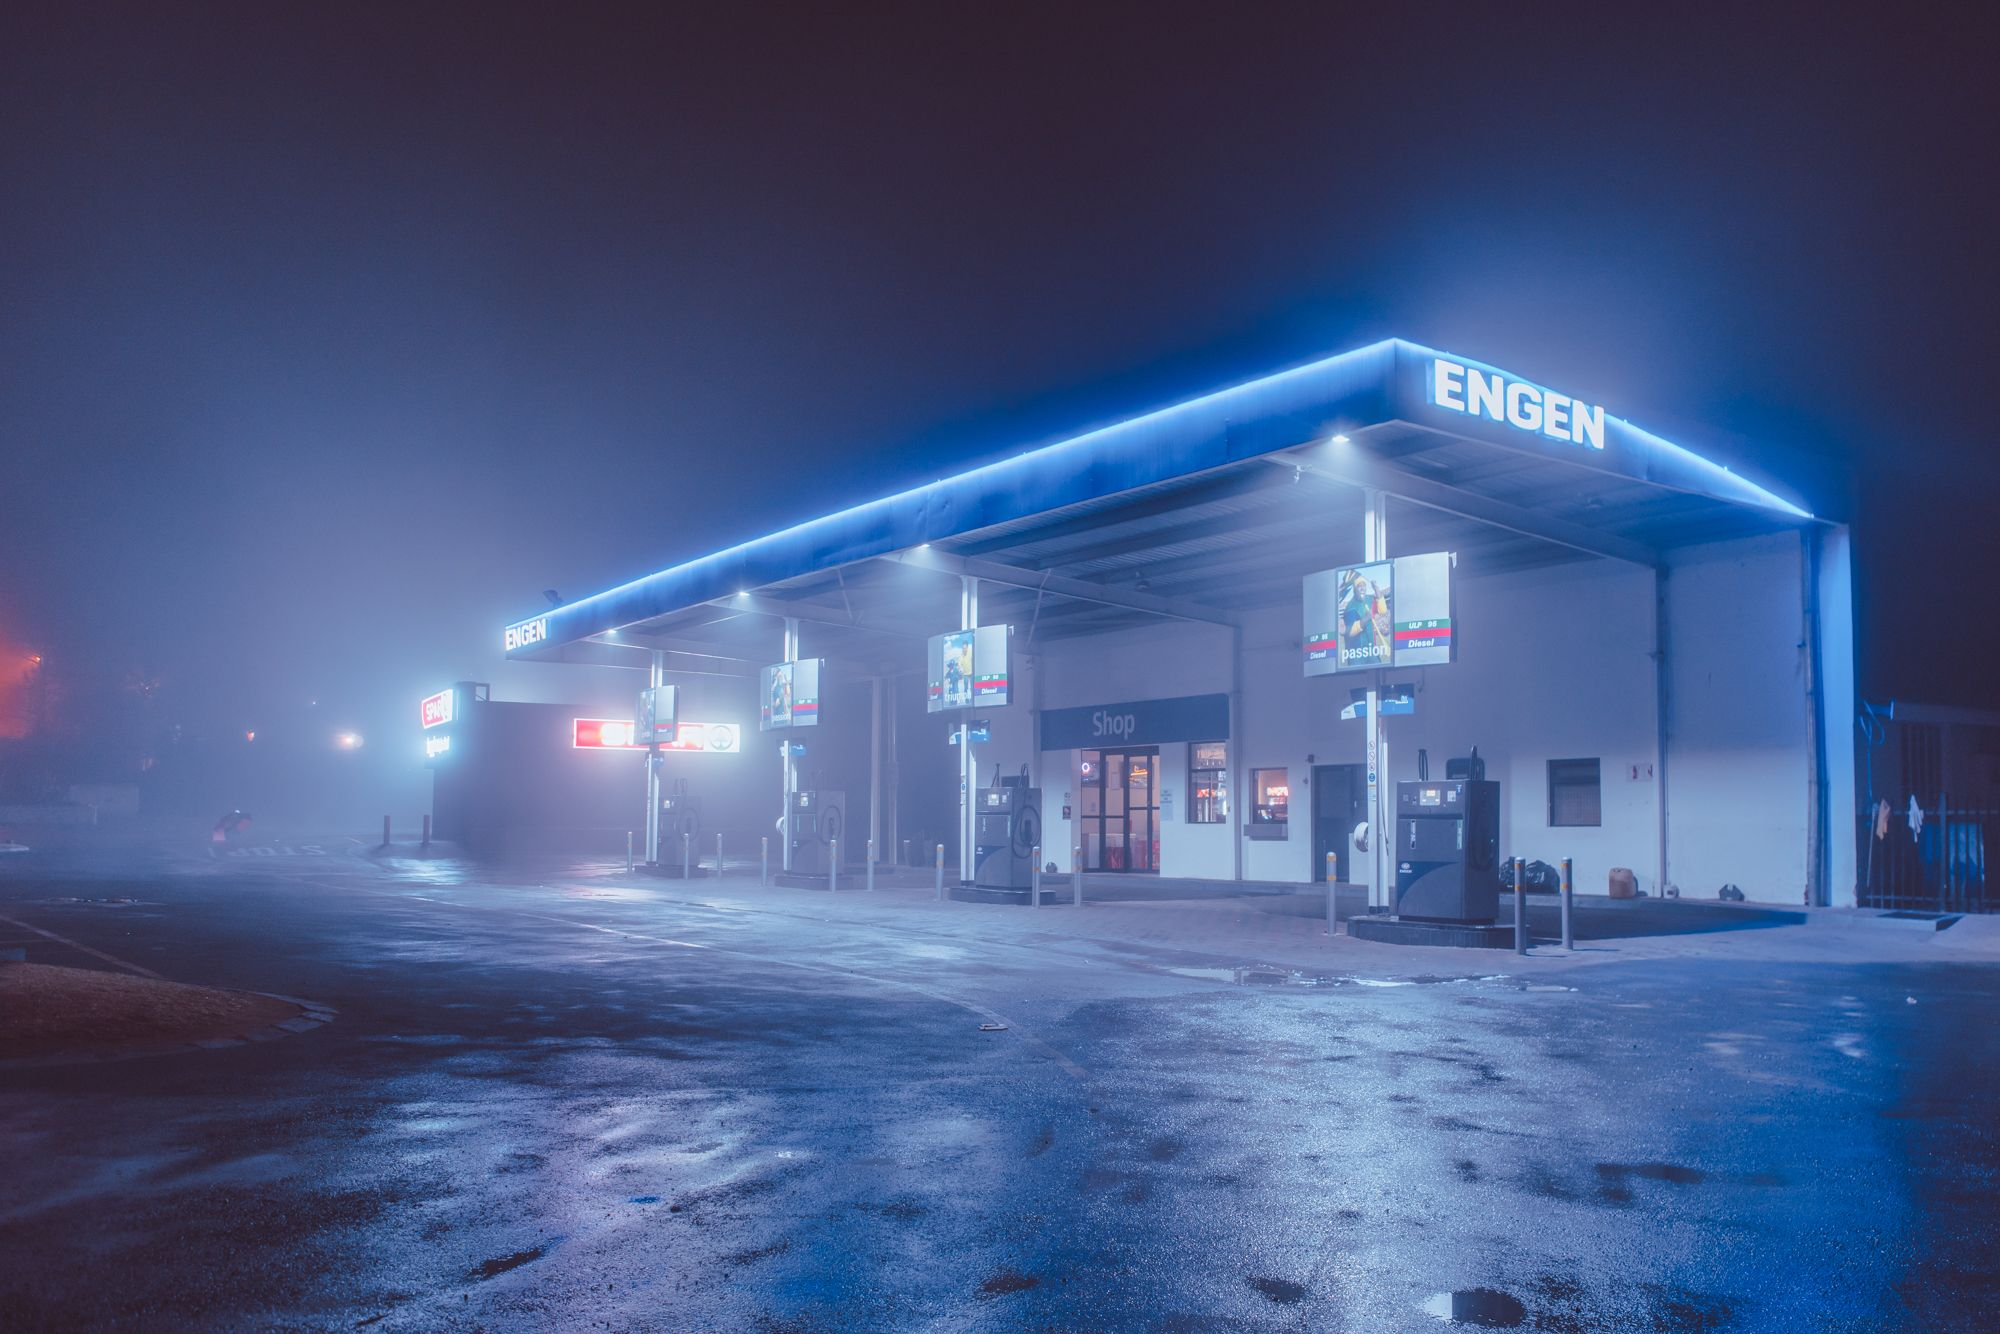 Midnight stop gas station desktop background images hd wallpaper - Midnight wallpaper hd ...